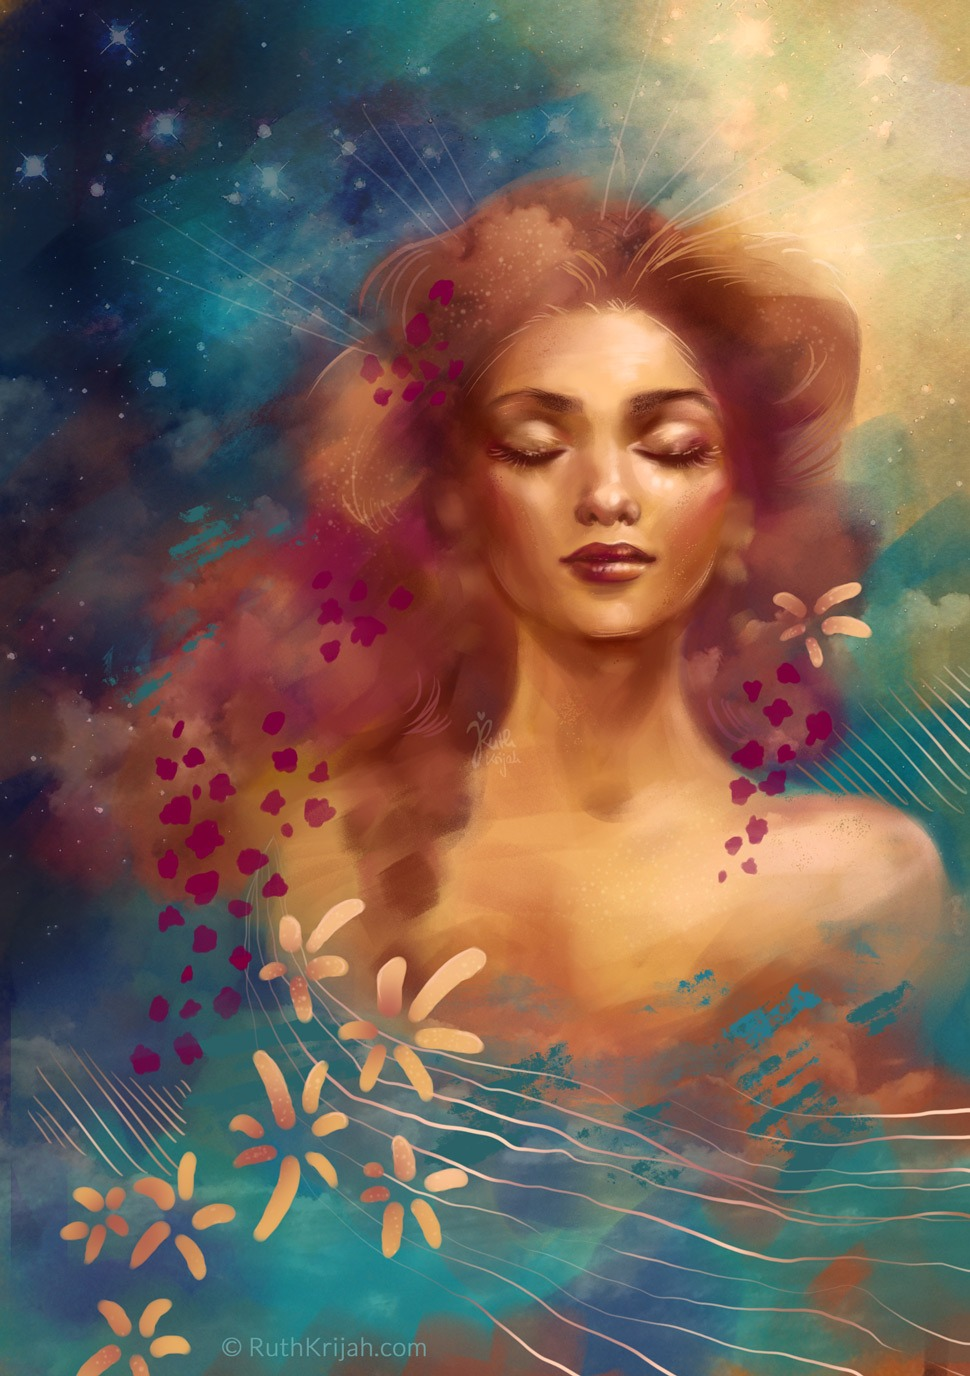 Gazing into Soul. Digital Painting by Ruth Krijah